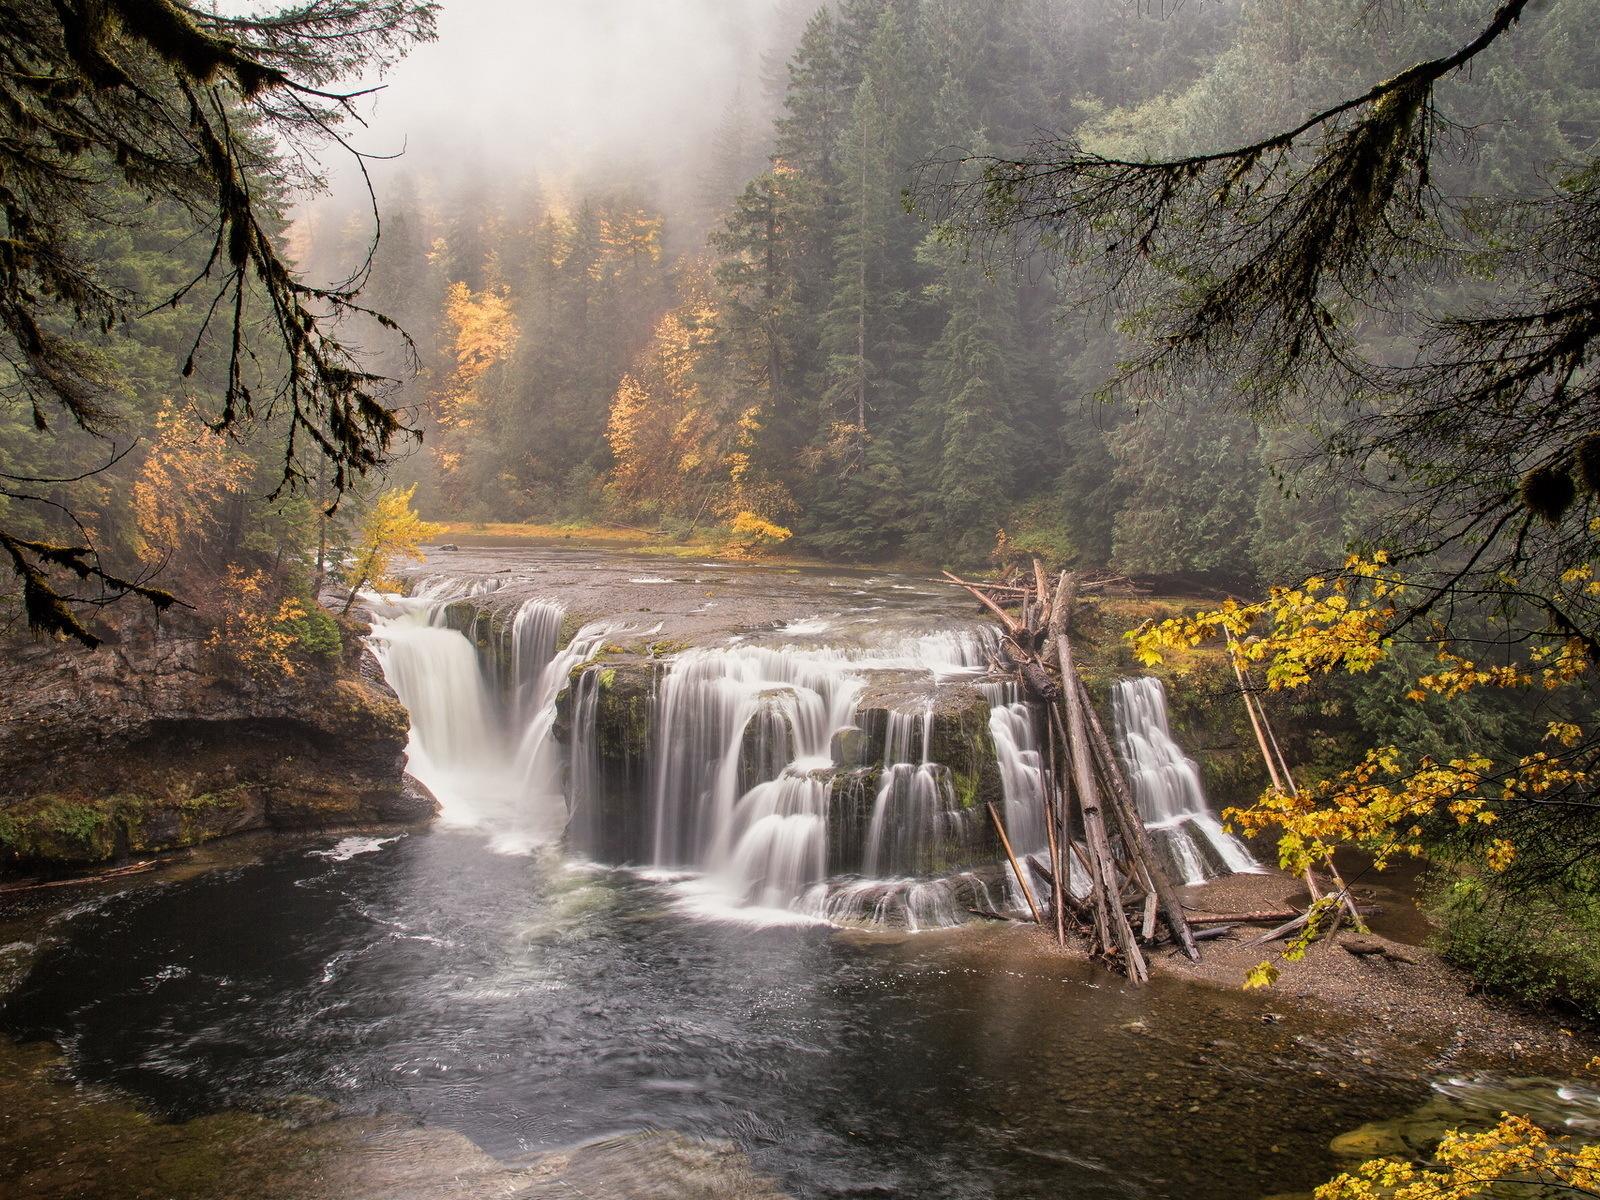 природа, пейзаж, деревья, лес, река, водопад, камни, туман